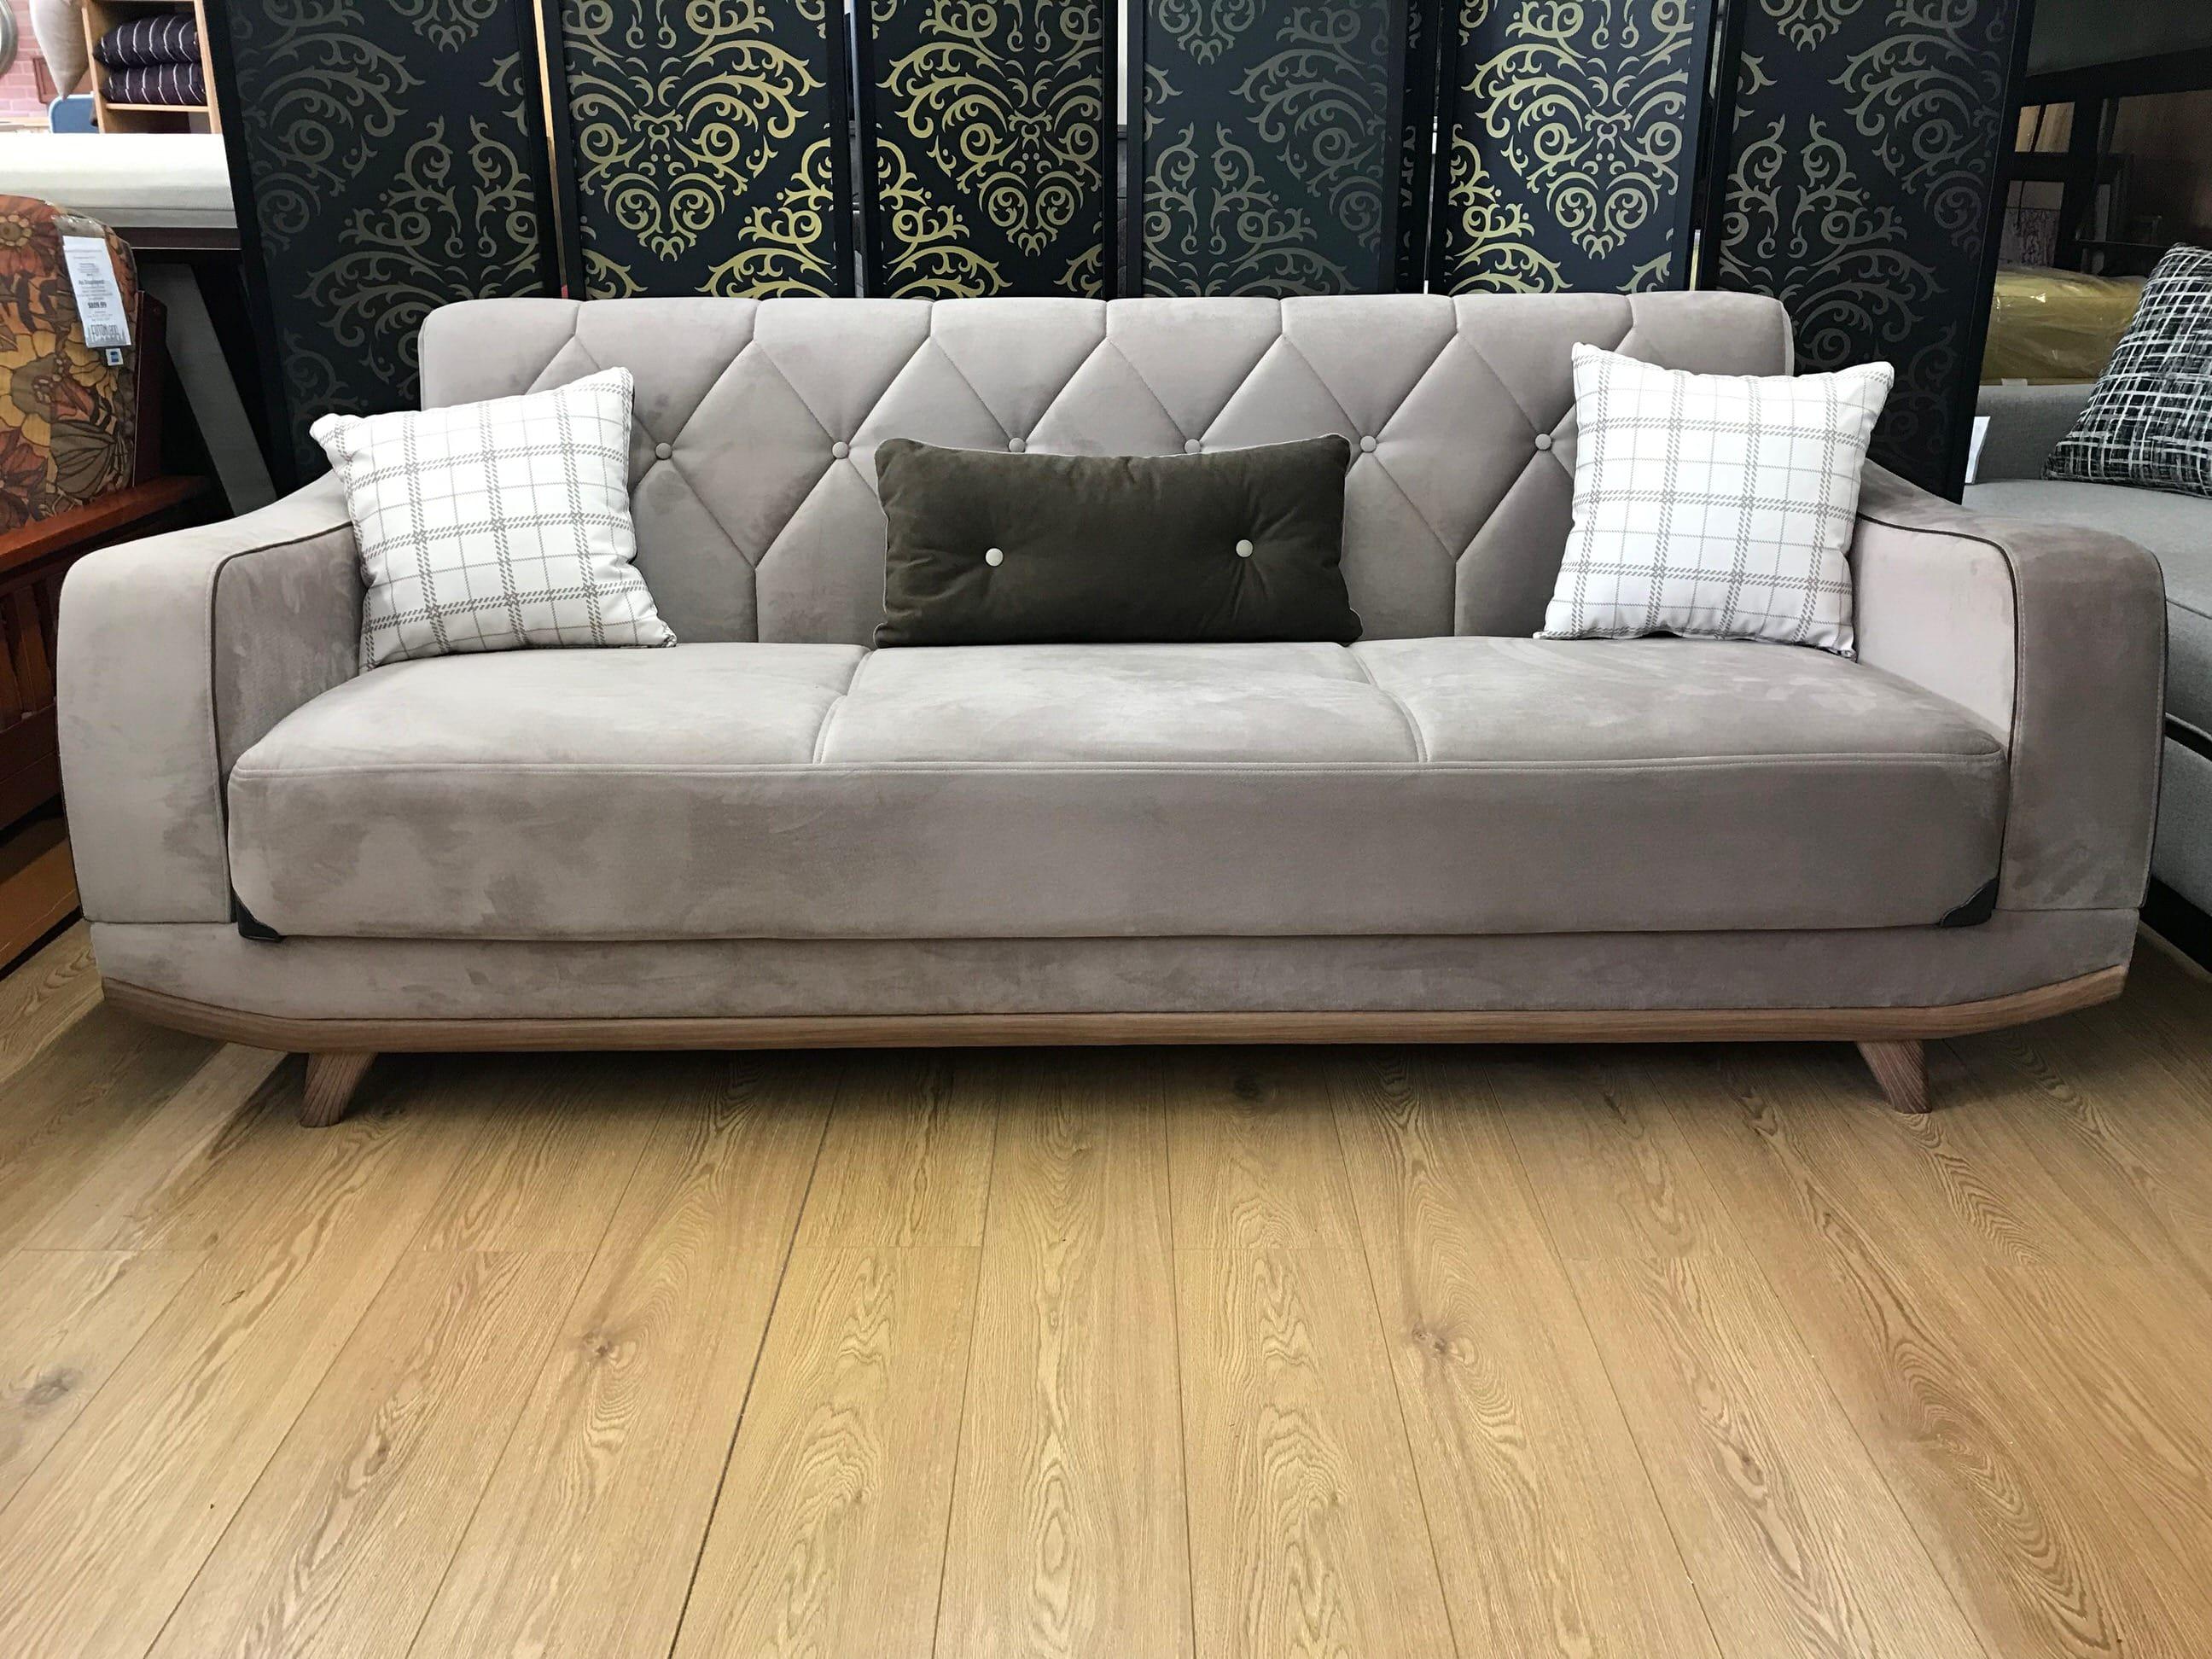 Paris Polo Vizon Convertible Sofa Bed by Istikbal Furniture